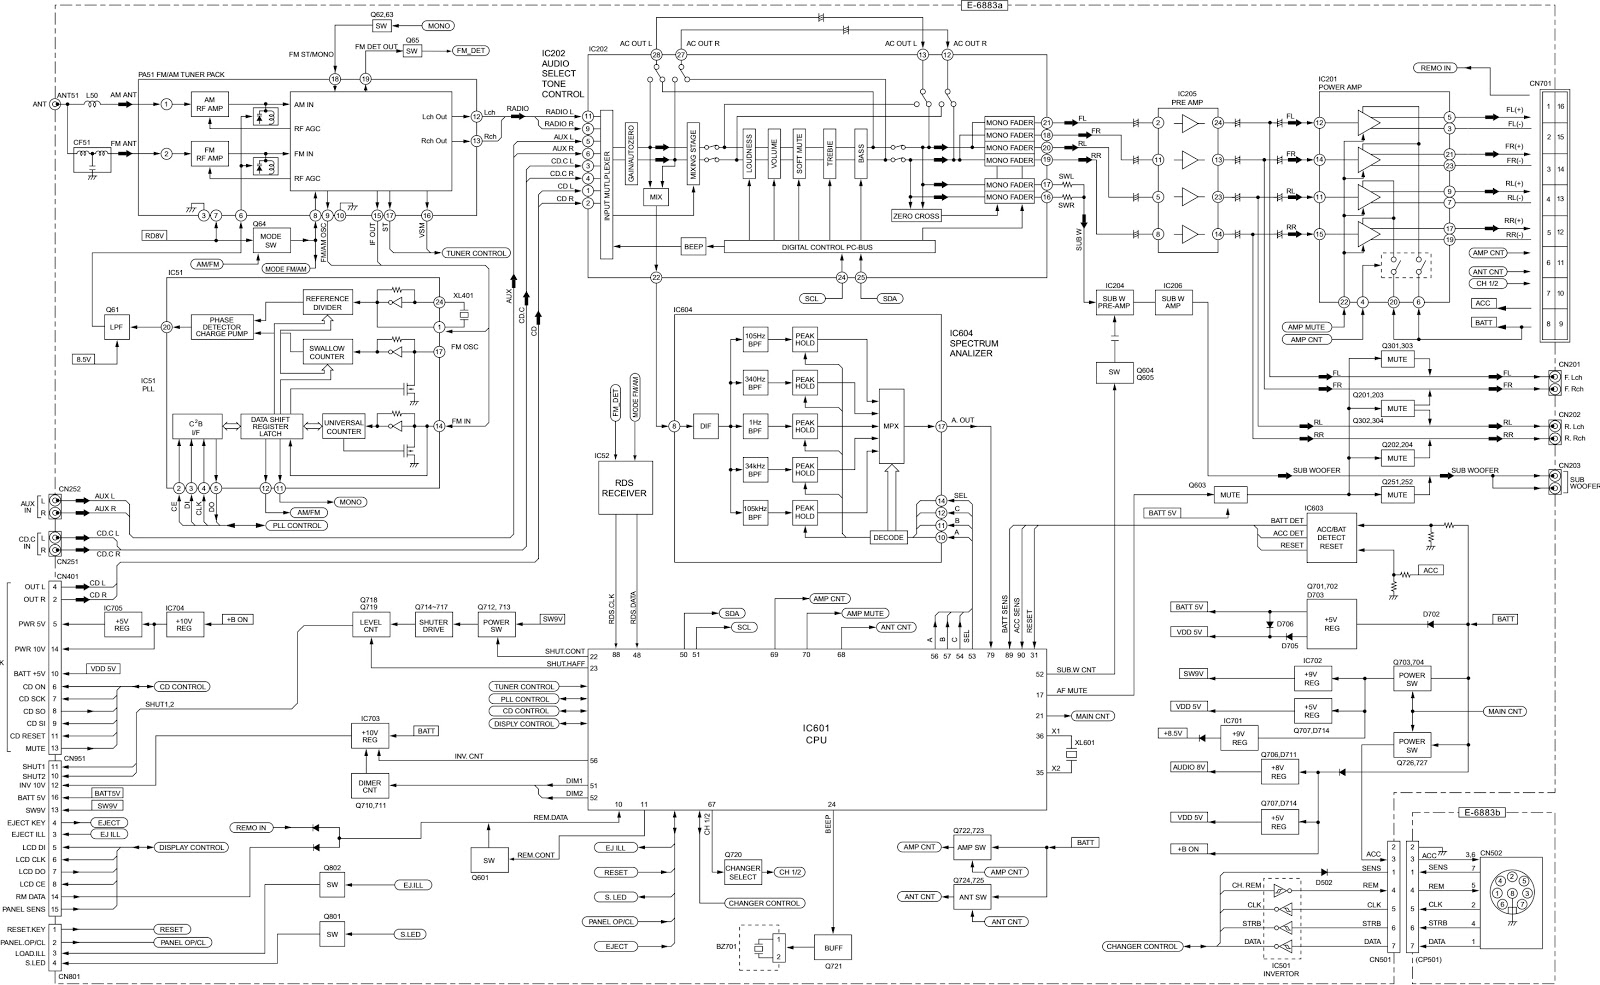 Panasonic Udqr003w7 Wiring Diagram